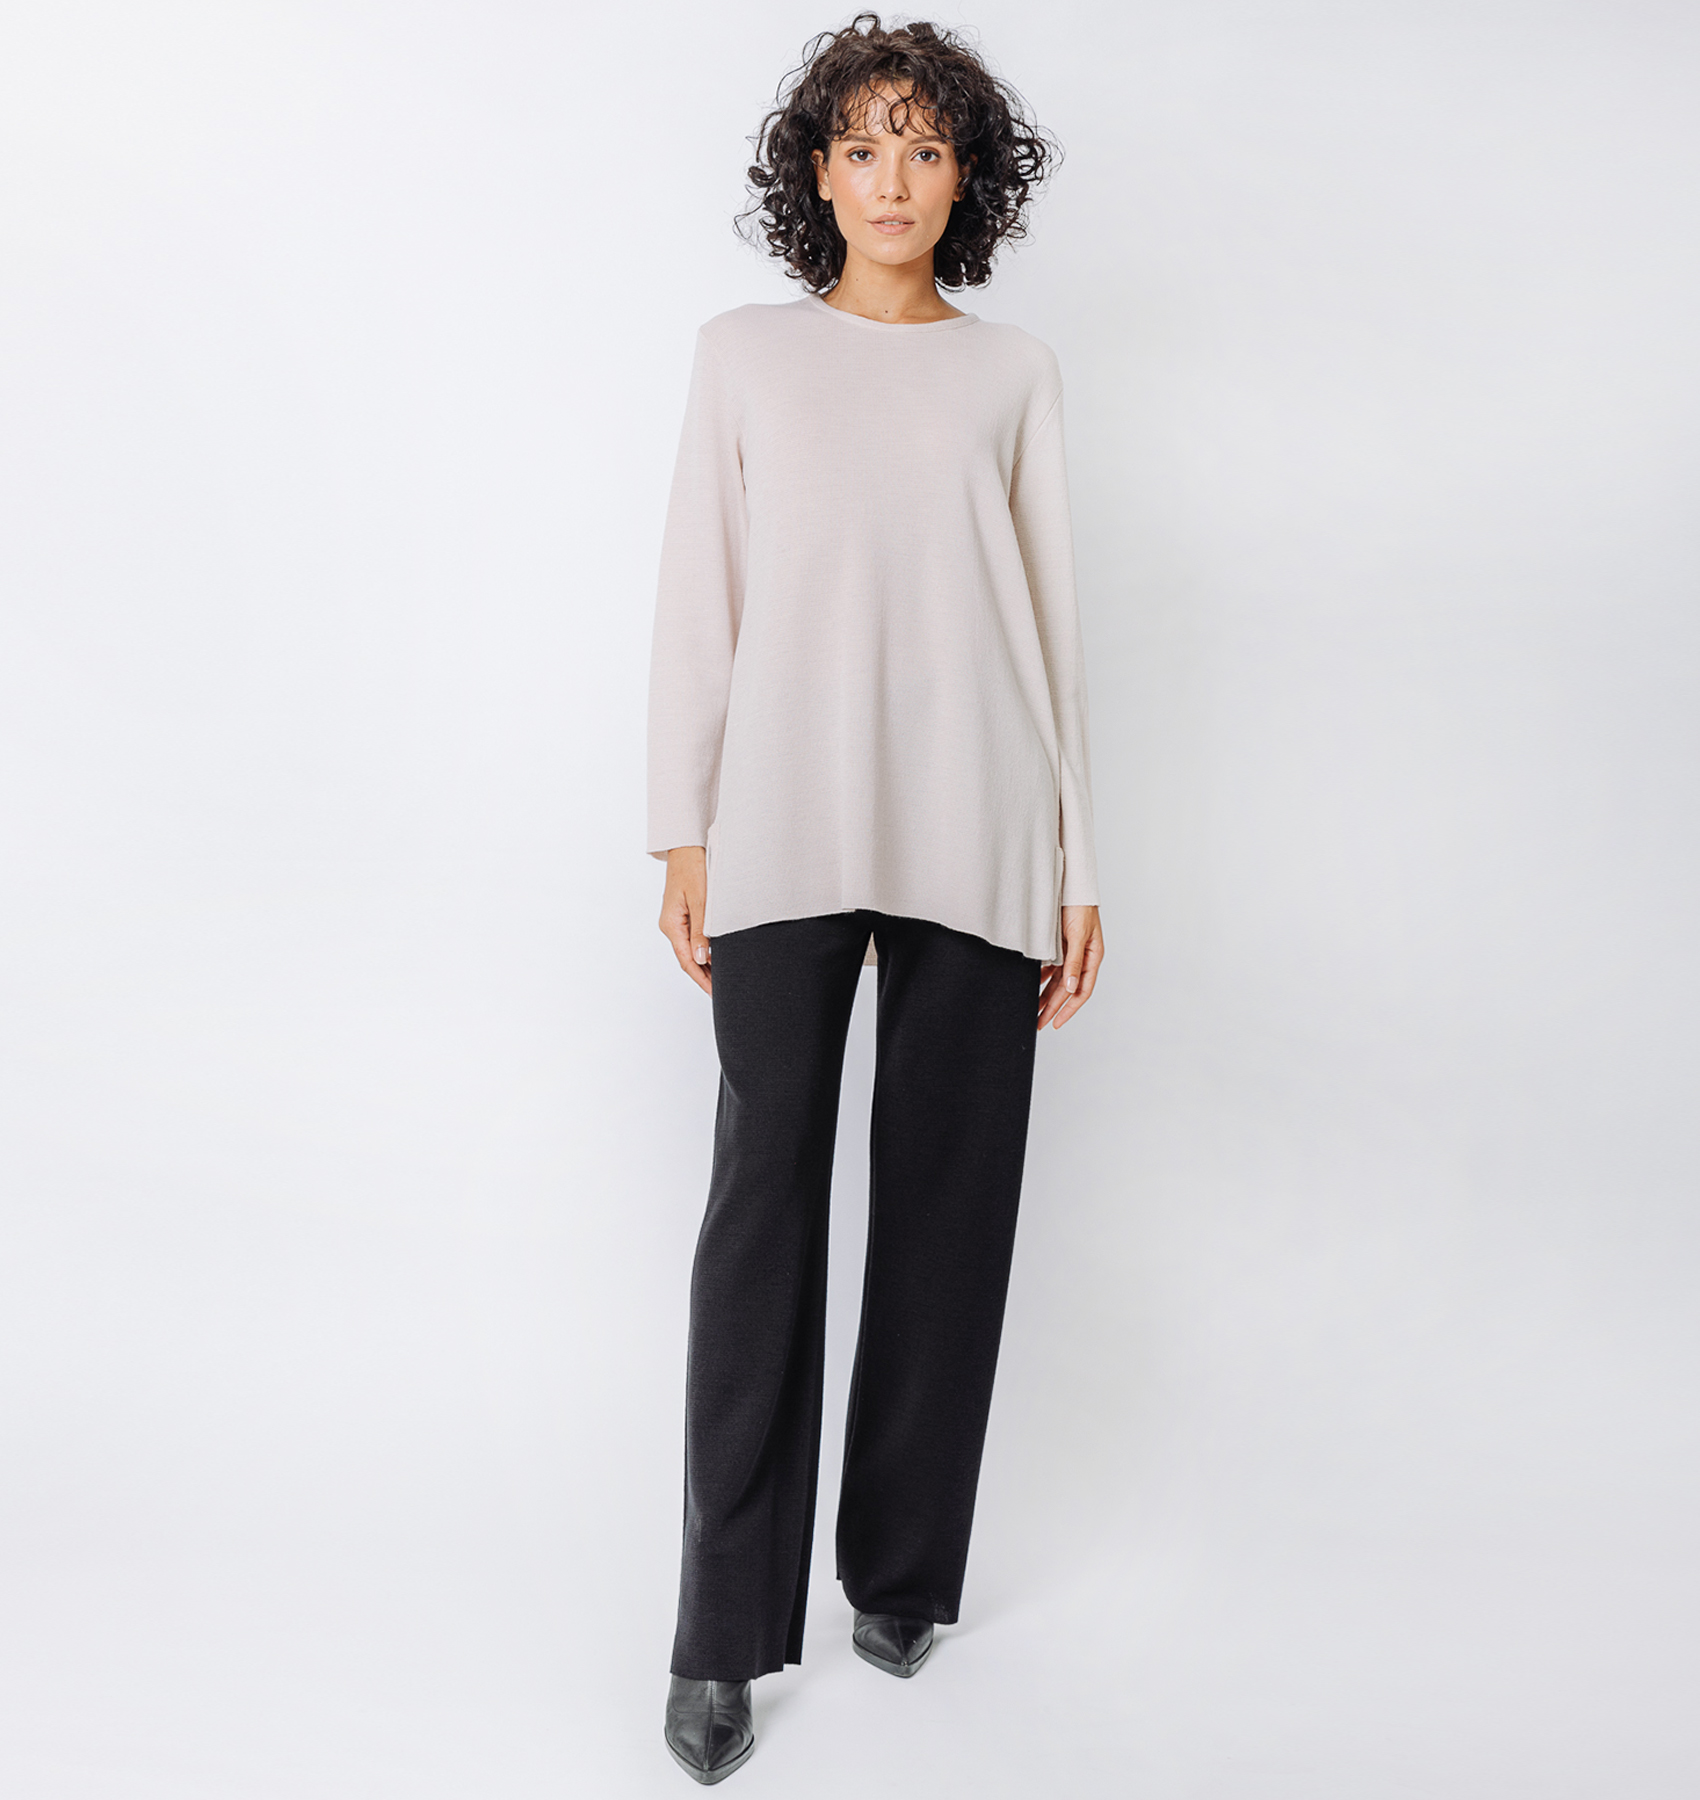 maglia MIDALI | TDINF63 970C4